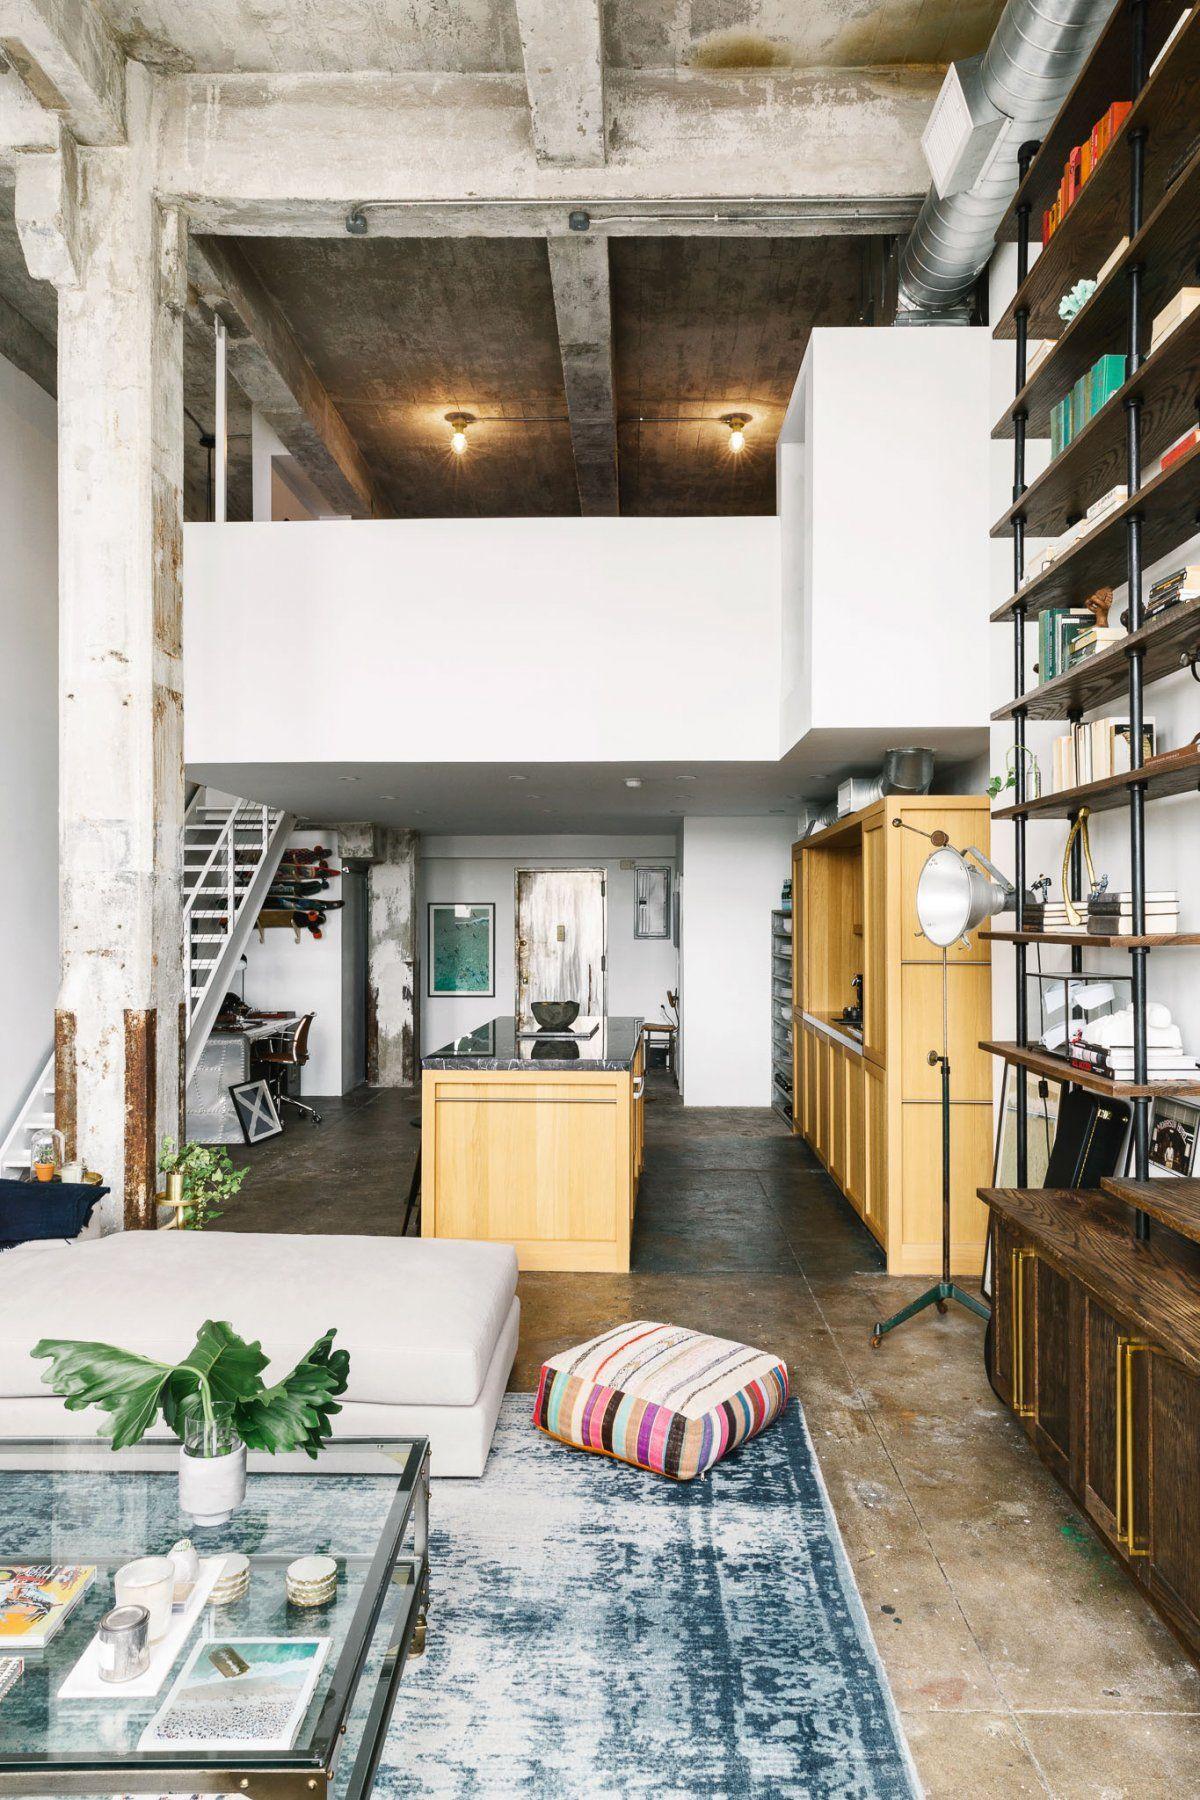 Take A Look Inside The Brooklyn Loft Of A Wall Streeter Turned Fragrance Entrepreneur Loft Apartment Decorating Loft Apartment New York Loft